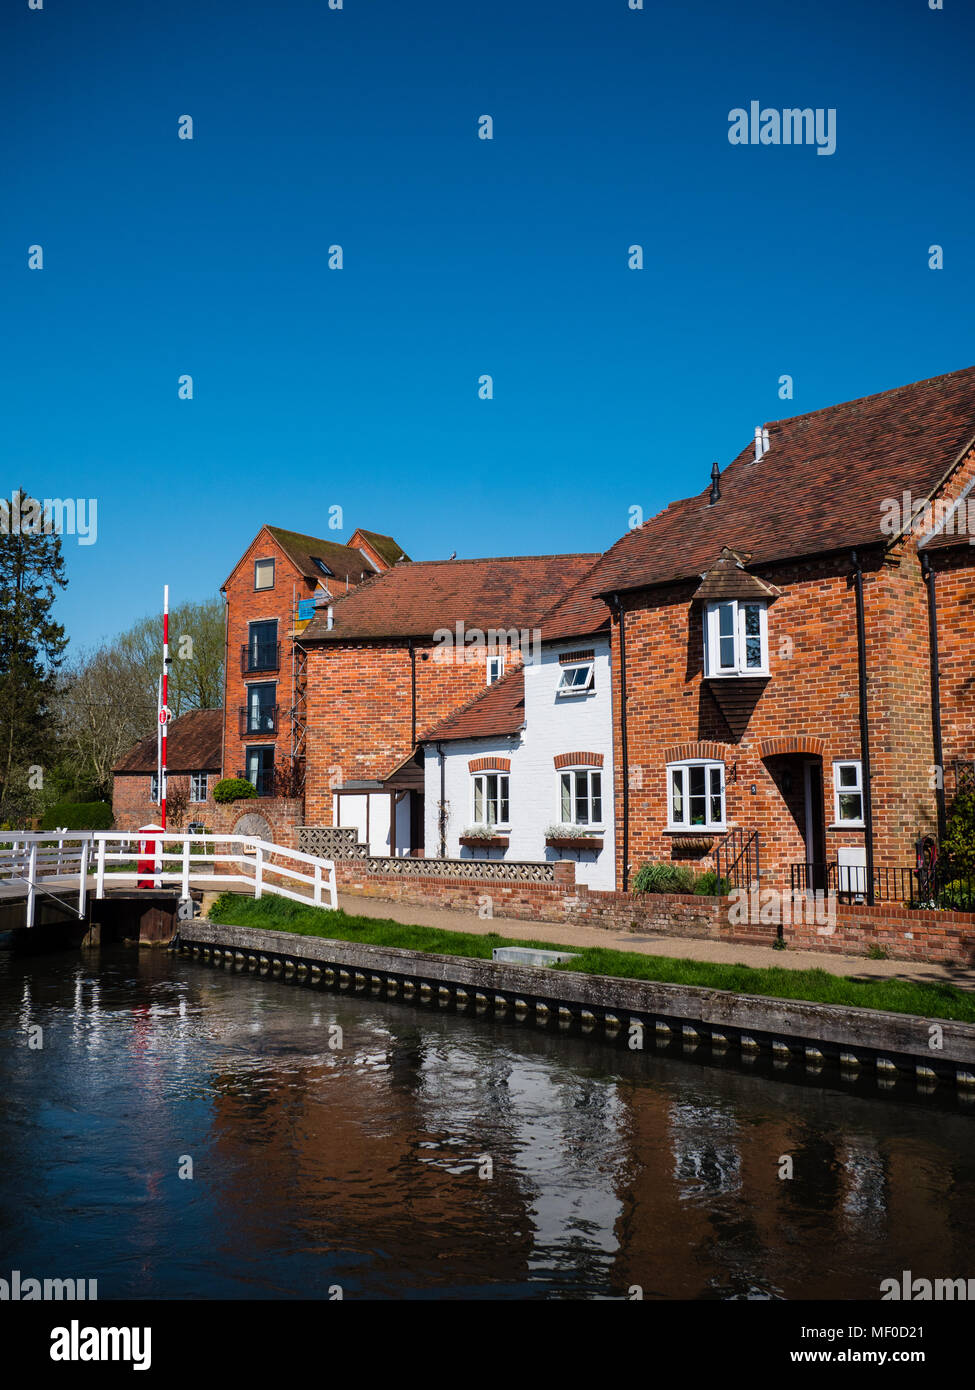 Bridge 62 West Mills Swingbridge, River Kennet, Newbury, Berkshire, England, UK, GB. - Stock Image